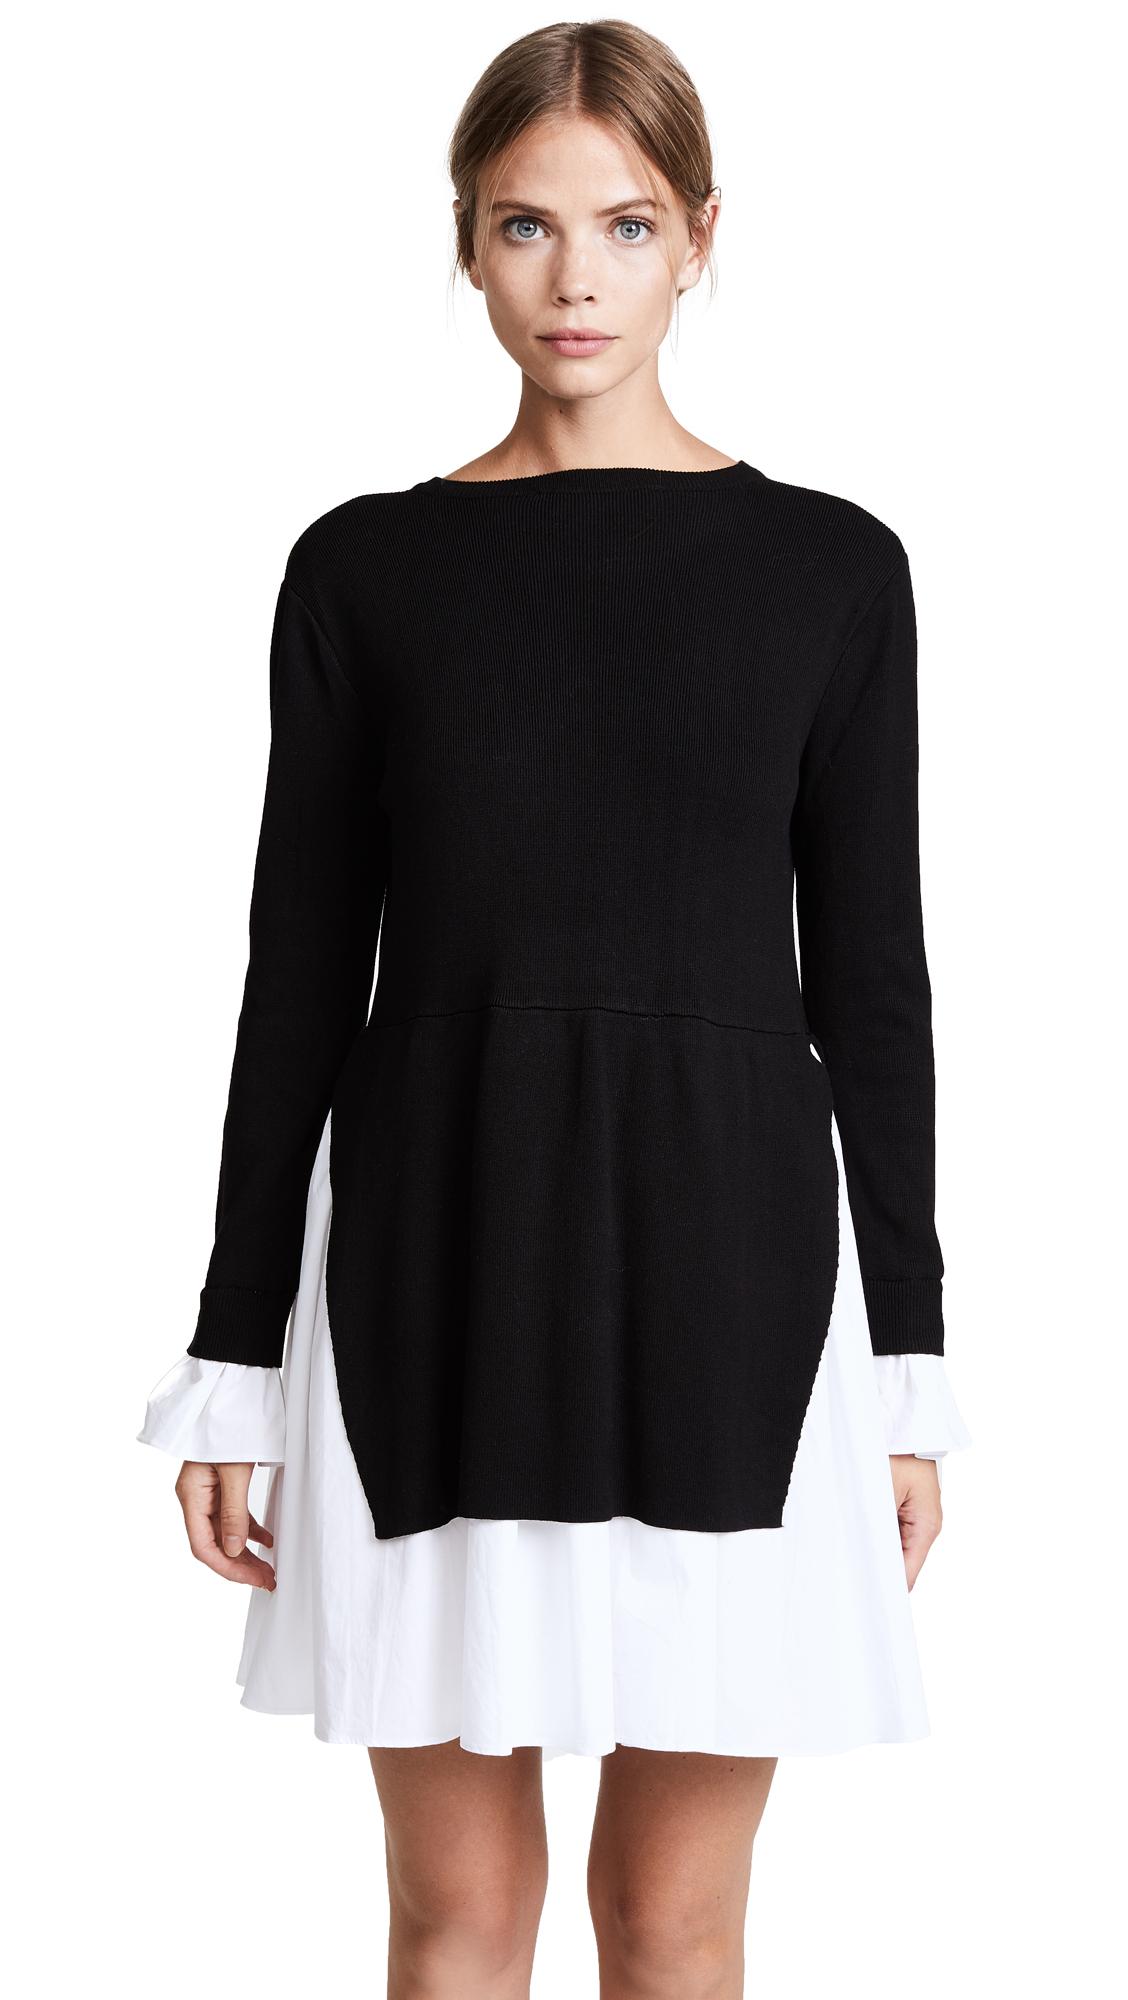 ENGLISH FACTORY Knit Combo Dress - Black